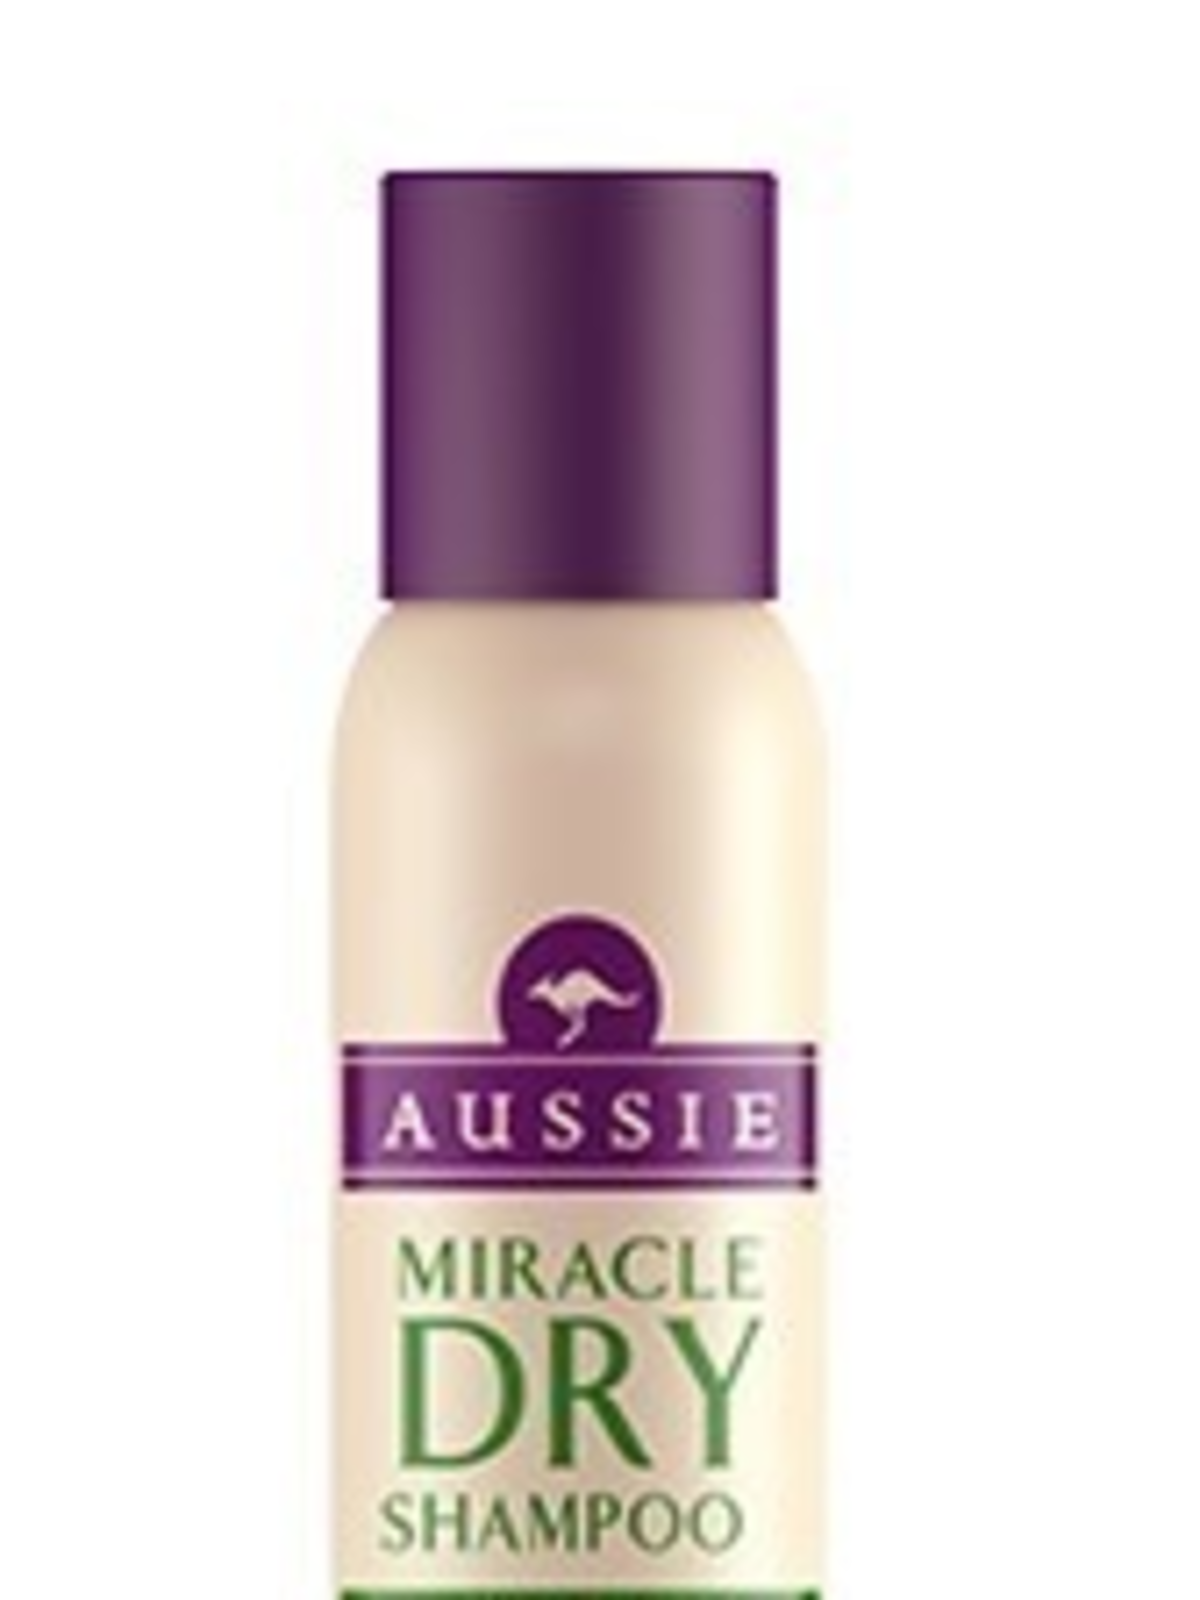 Aussie, Aussome Volume, Miracle Dry Shampoo